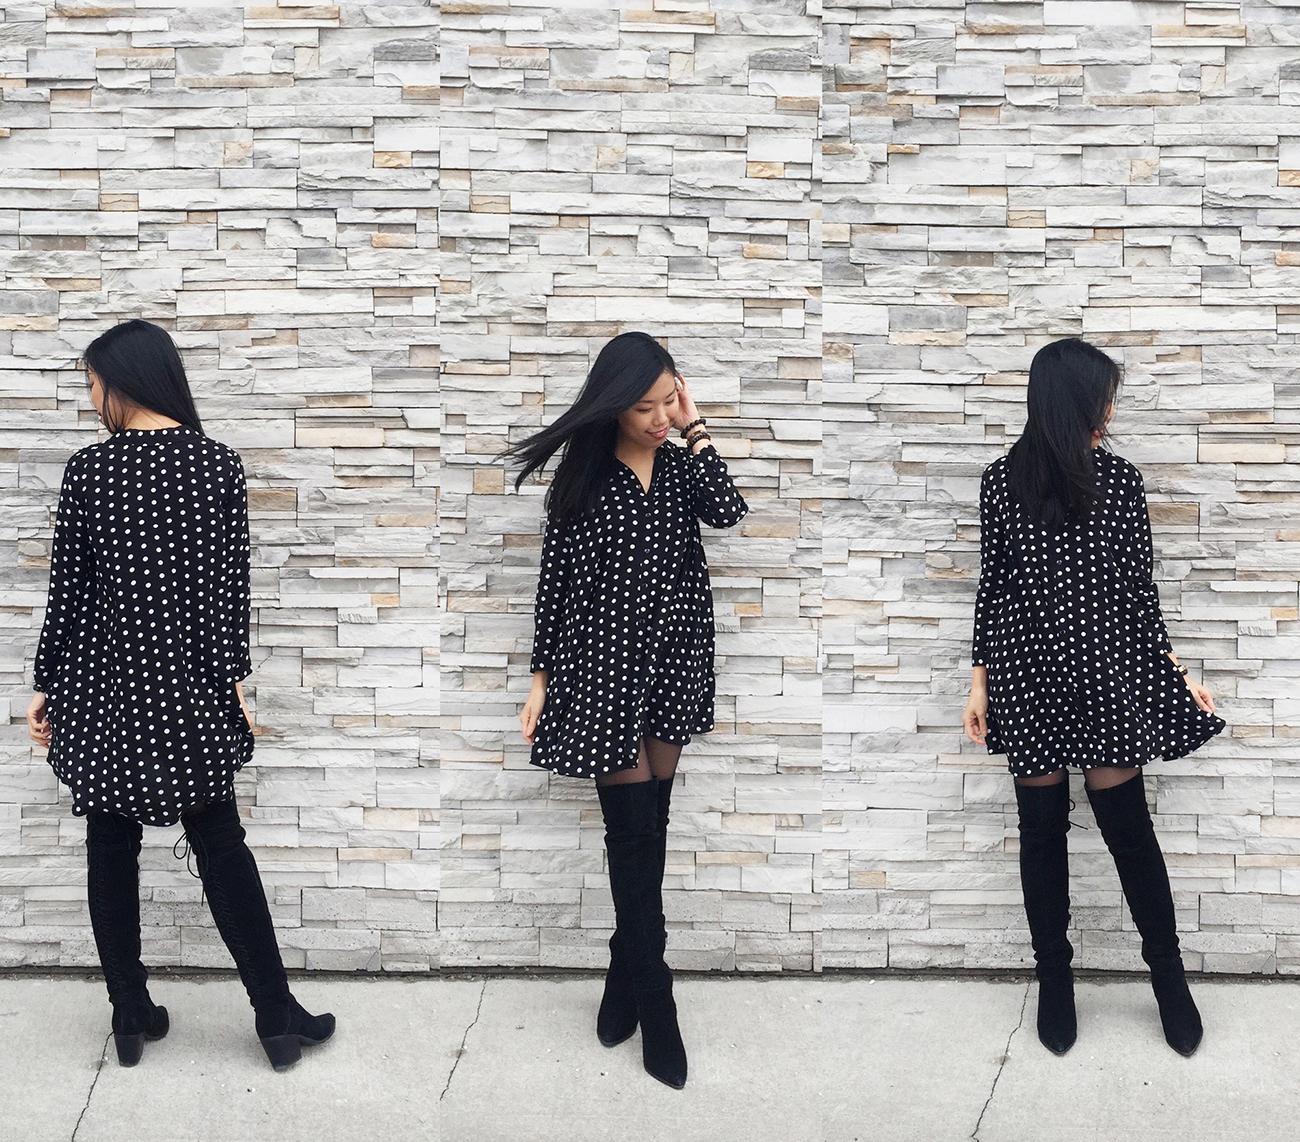 My Obsession Monday - Zara Polka Dot Dress - Outfit.jpg